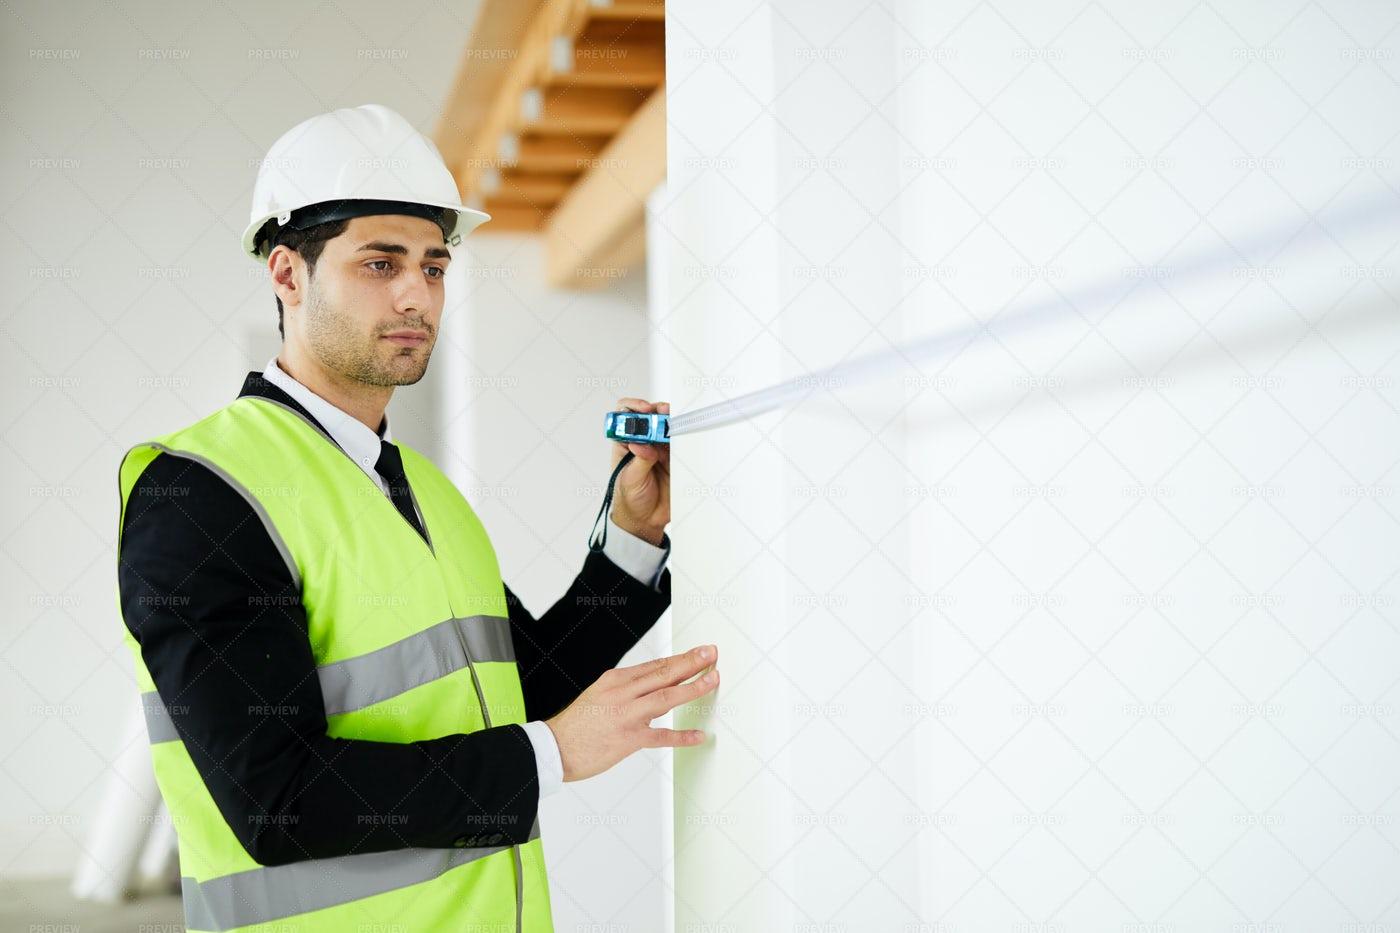 Engineer Measuring Walls: Stock Photos